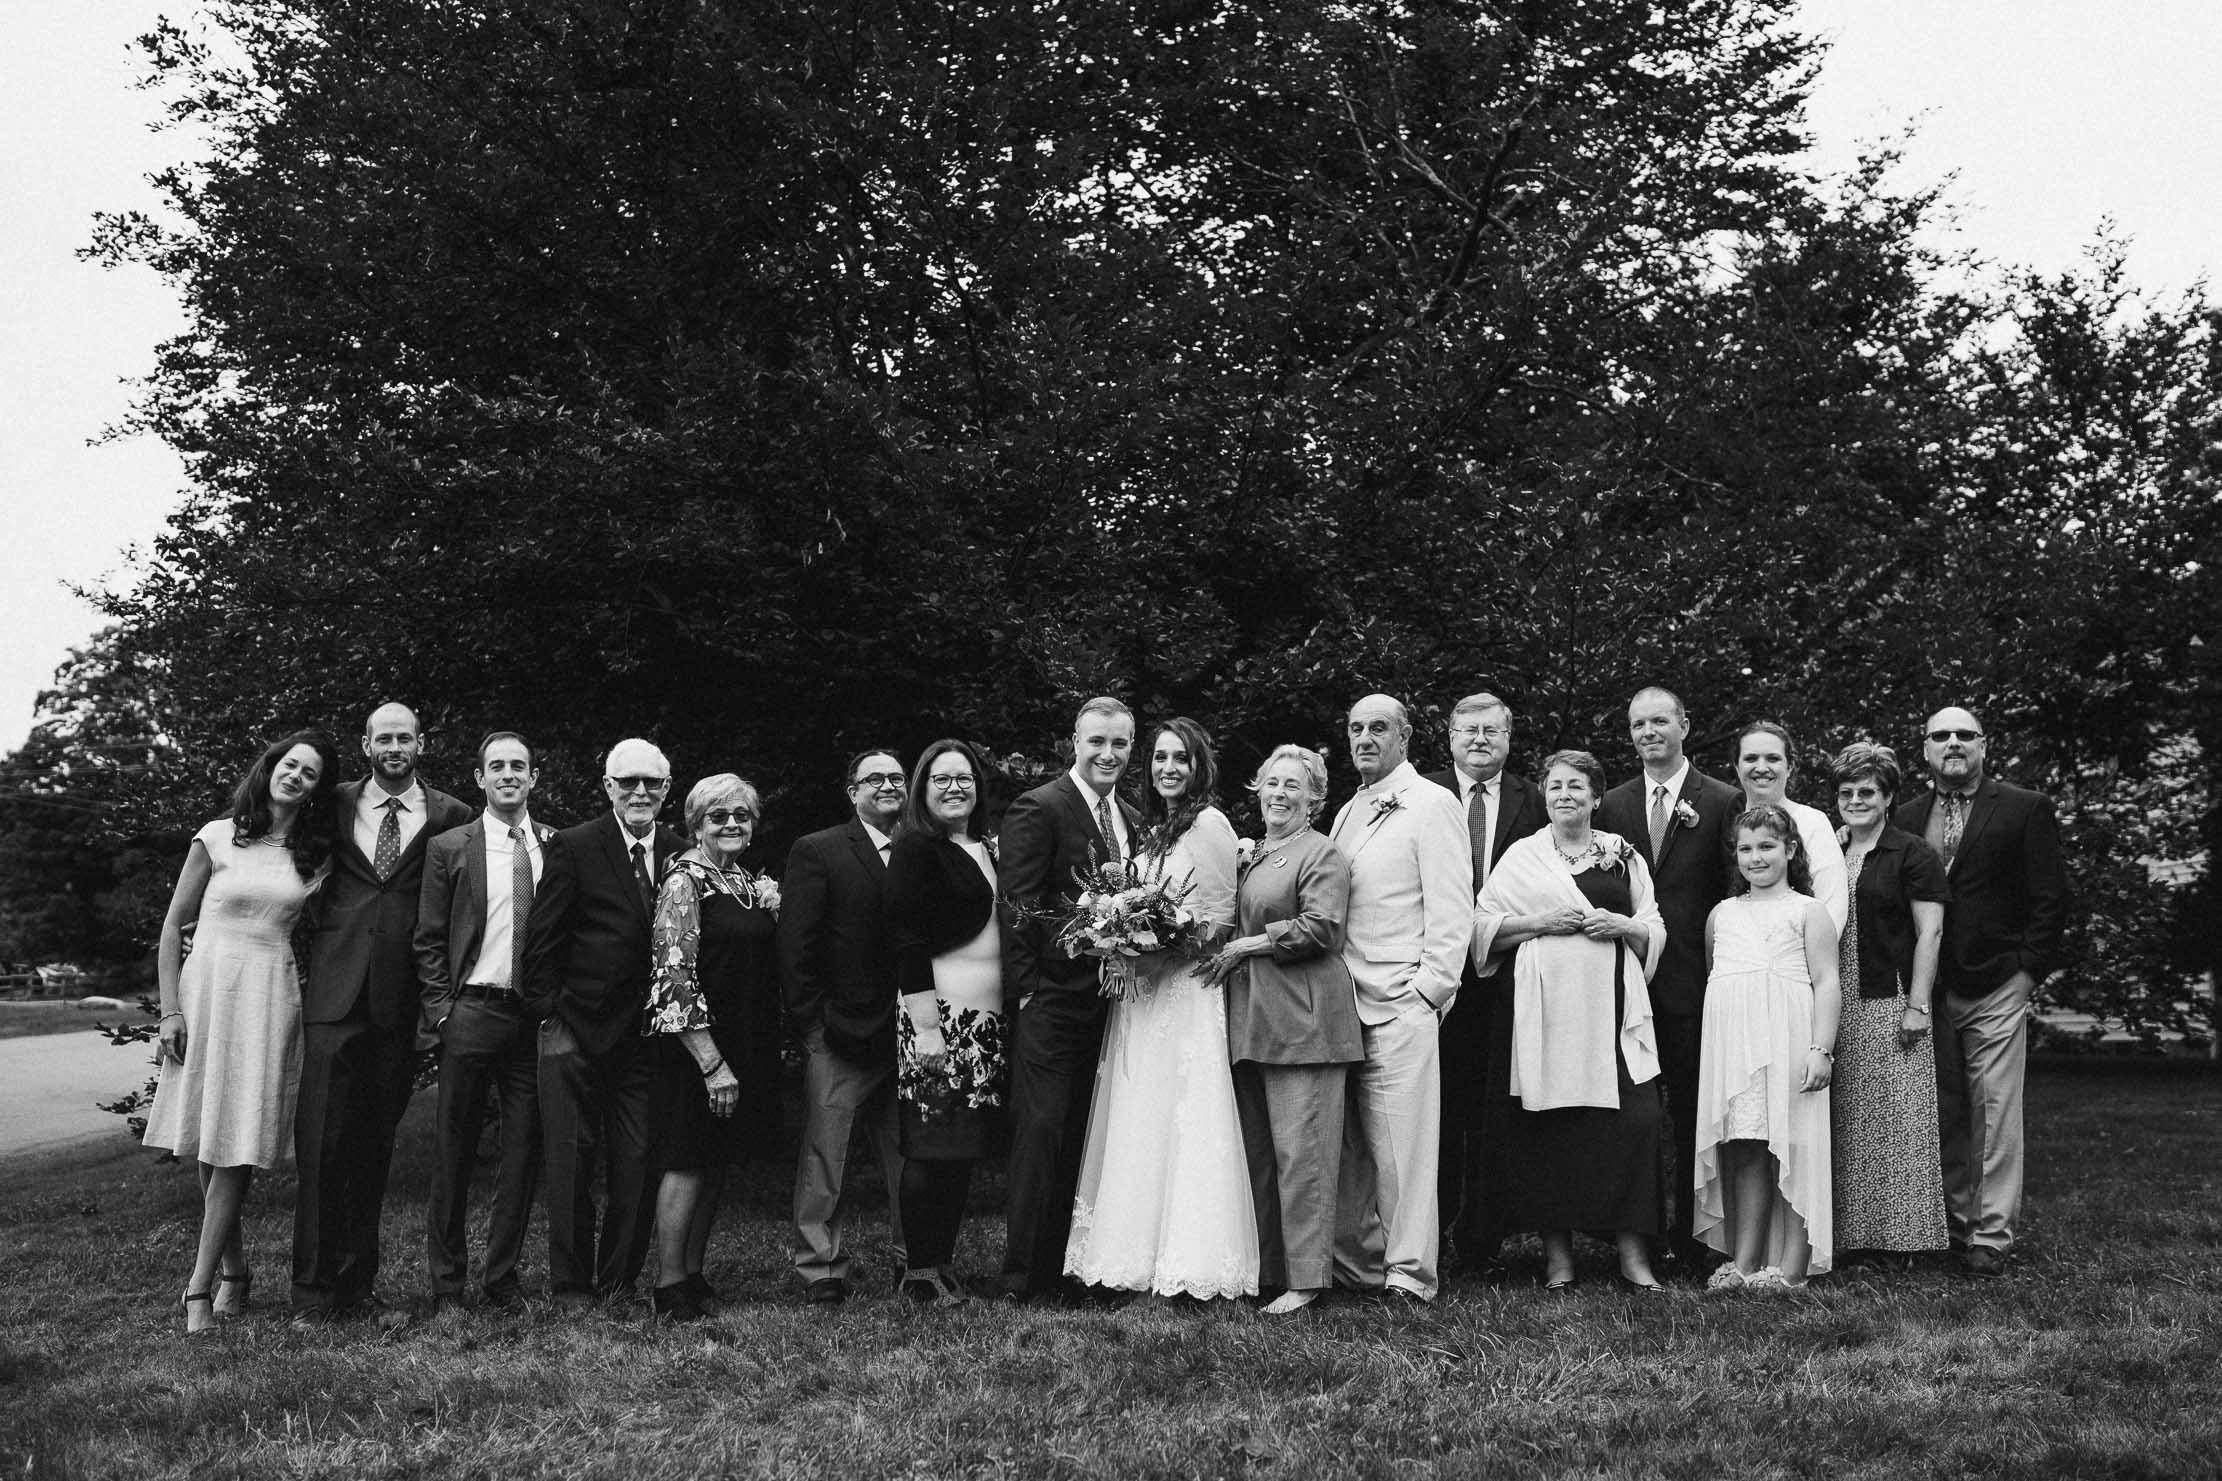 Wings-Castle-Millbrook-NY-Upstate-Wedding-Photographer-1042.jpg